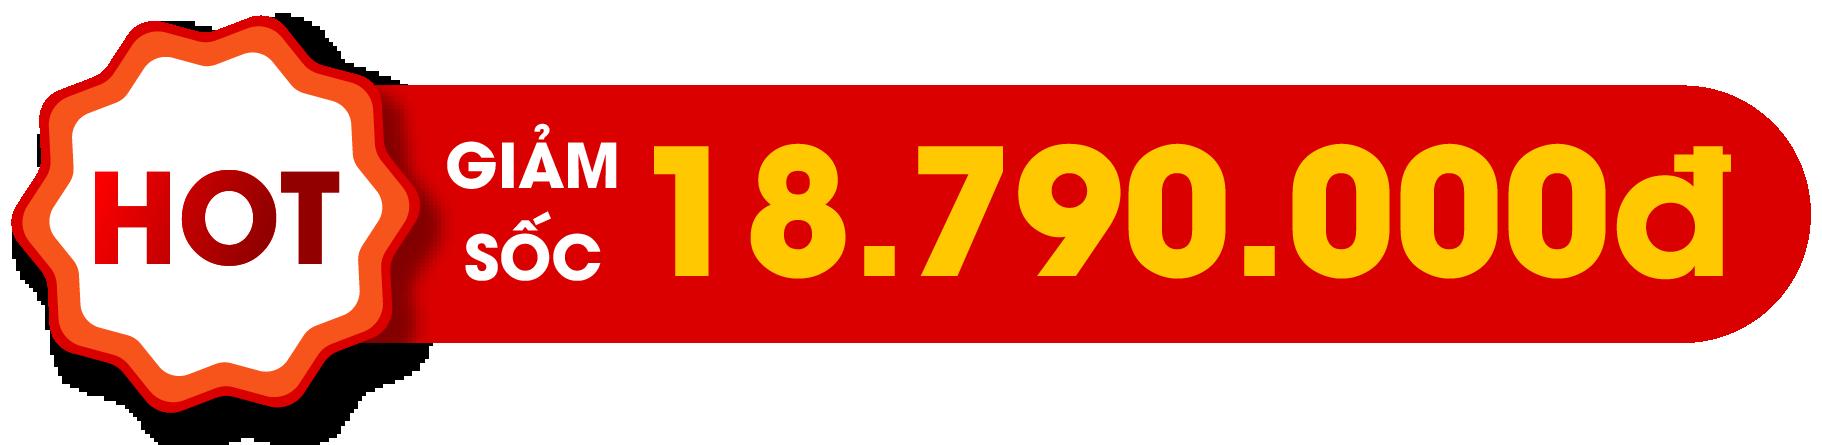 iPhone 12 64GB giá sốc